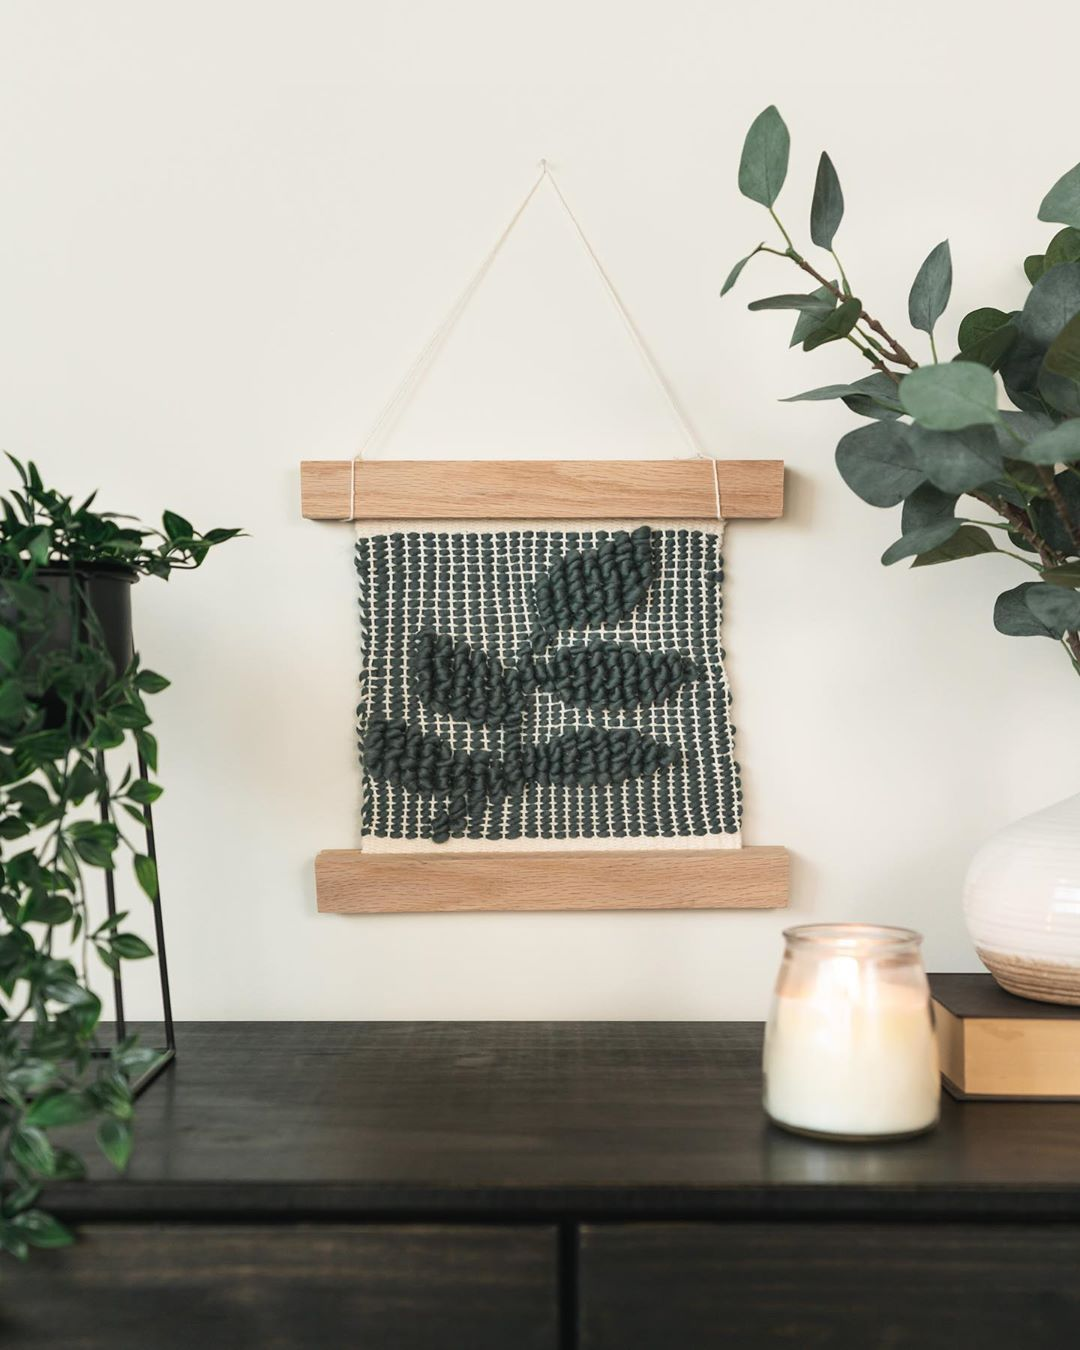 Pibione Weaving by Spruce  Linen.   #pibione #wovenwallhanging #wovenwallart #slweavingclub #pibones #pibioneweaving #weavingtechnique #weaving #frameloomweaving #weavinglove #weavingwallhanging #fiberartistsofinstagram #weaverfever #textileart #makersgonnamake #weaversofinstagram #tpaestry #homedecor #handmadehomedecor #weavingcommunity #tapestryweaving #wovenwallart #handweaving #weavingyarn #modernweaving #textiles #fiberartist #makersmovement #textiledesign #etsy